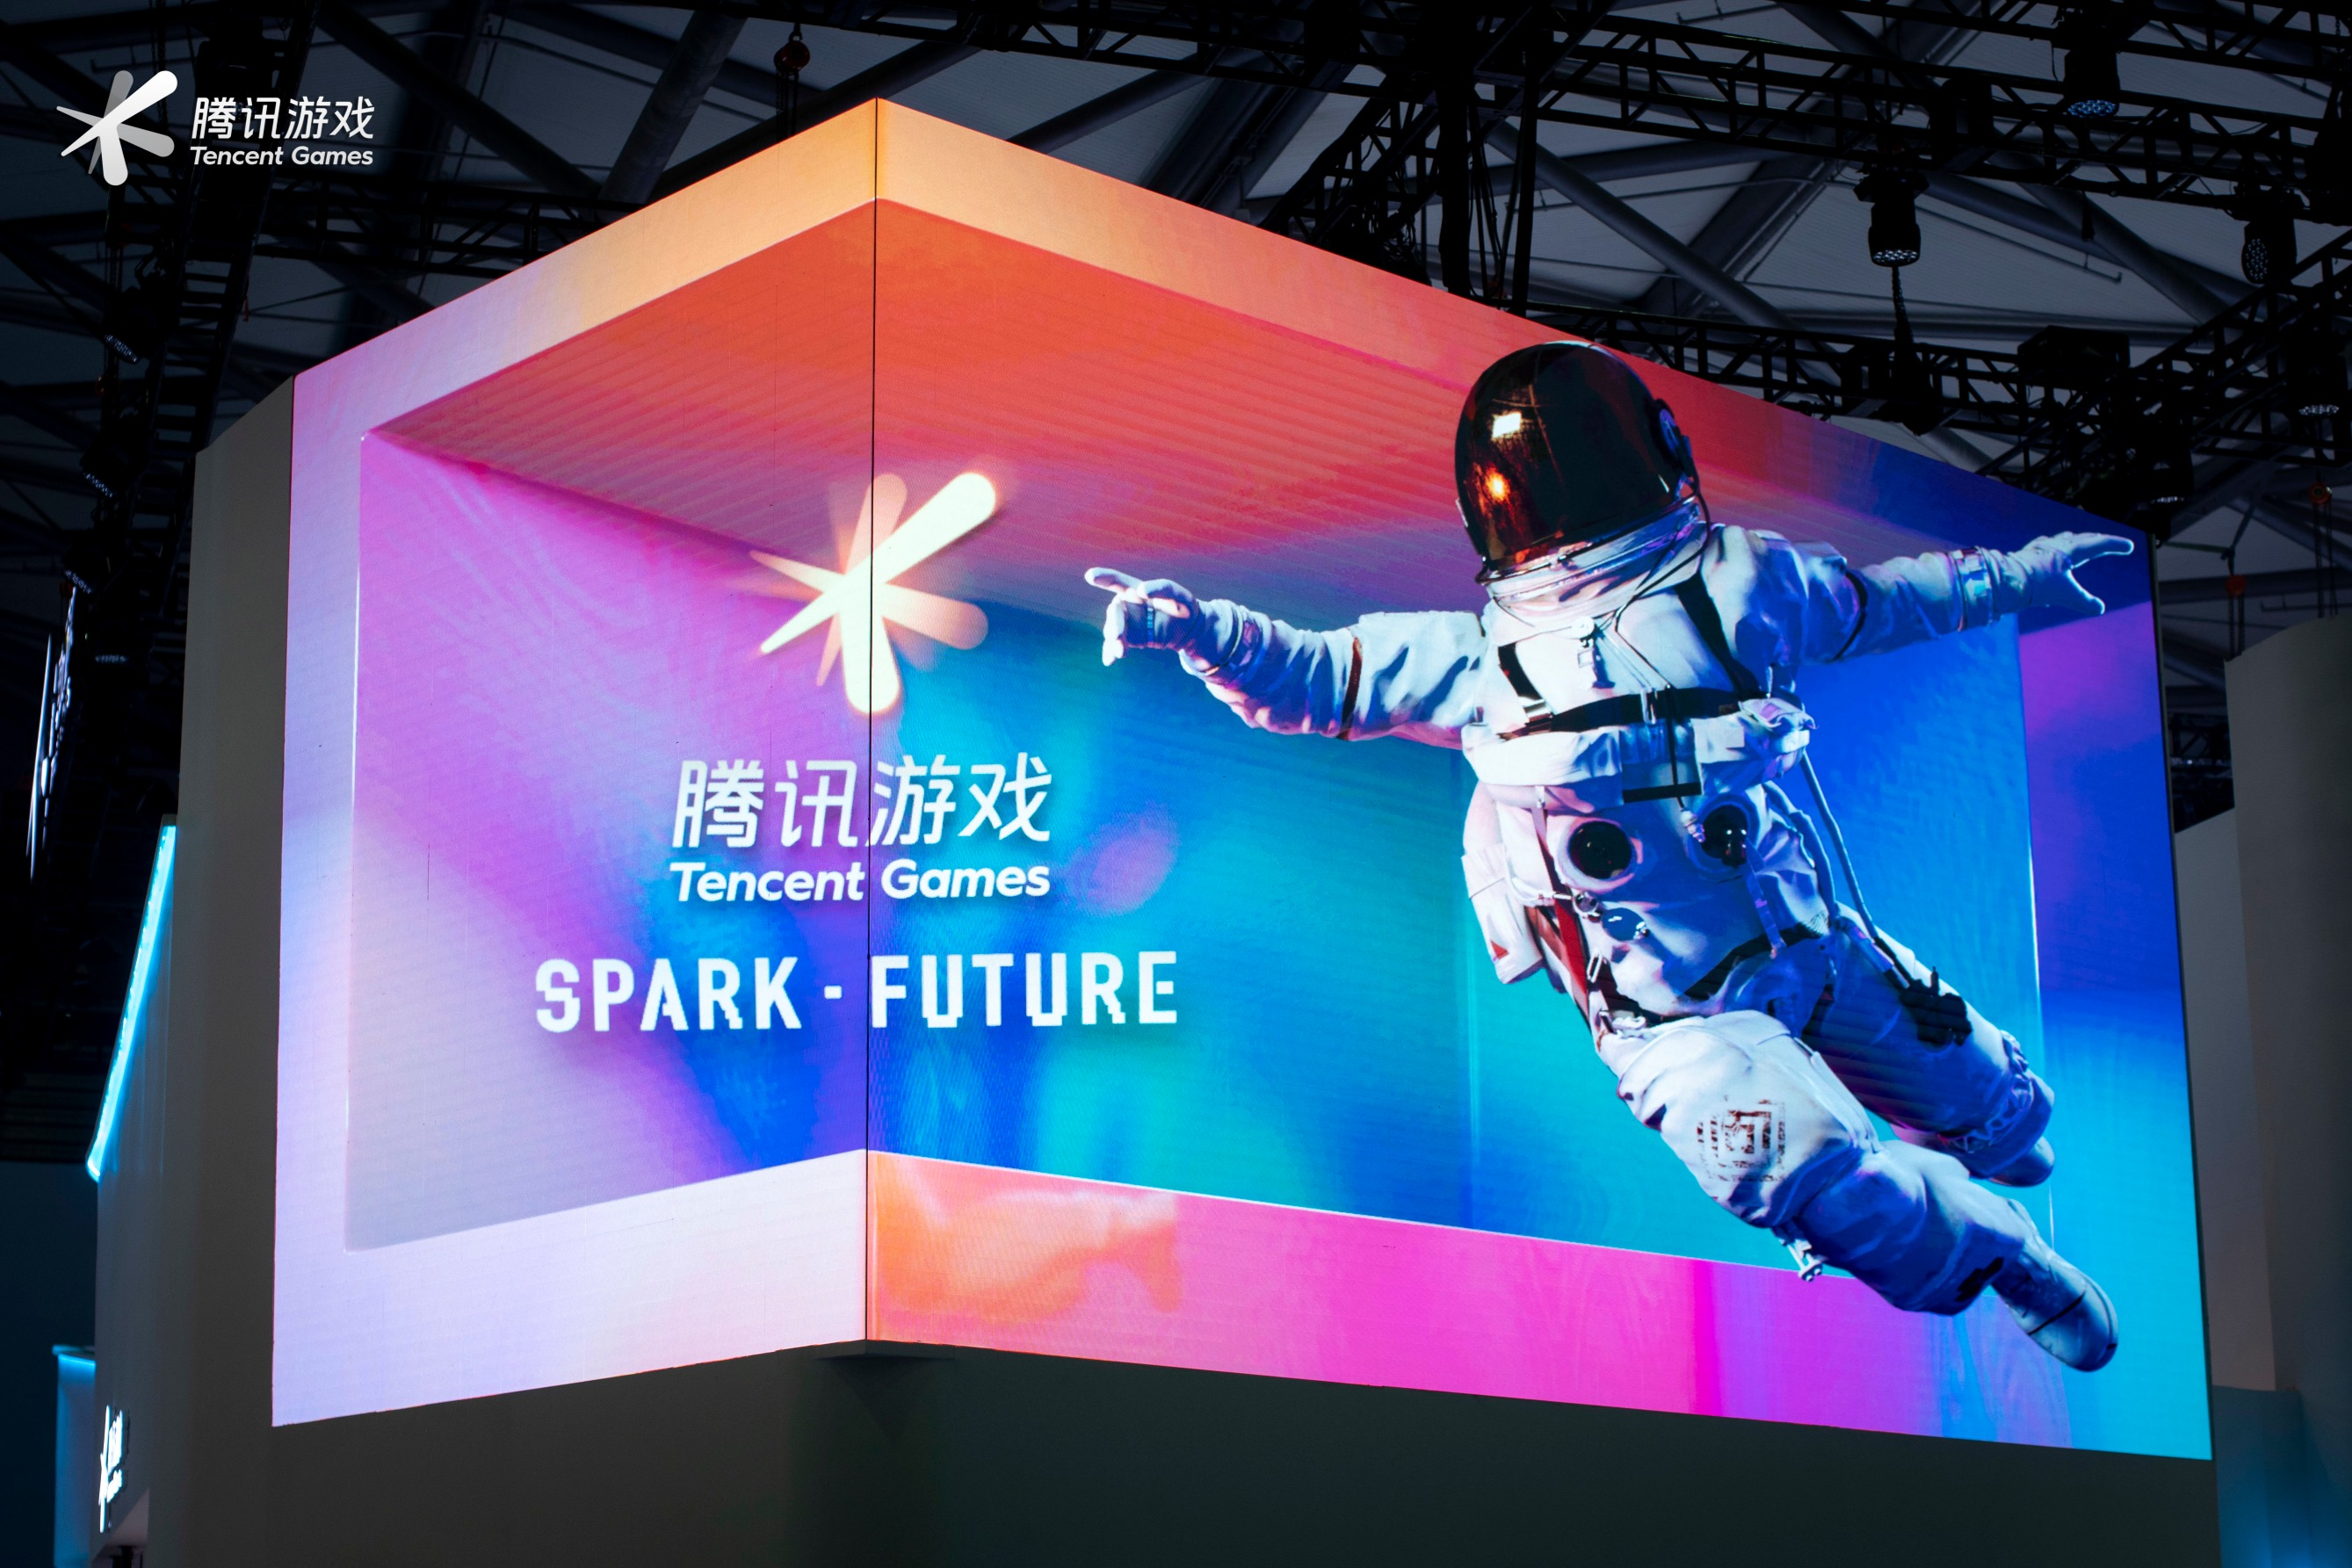 ChinaJoy2021如期开幕,20余款新游亮相腾讯游戏展区